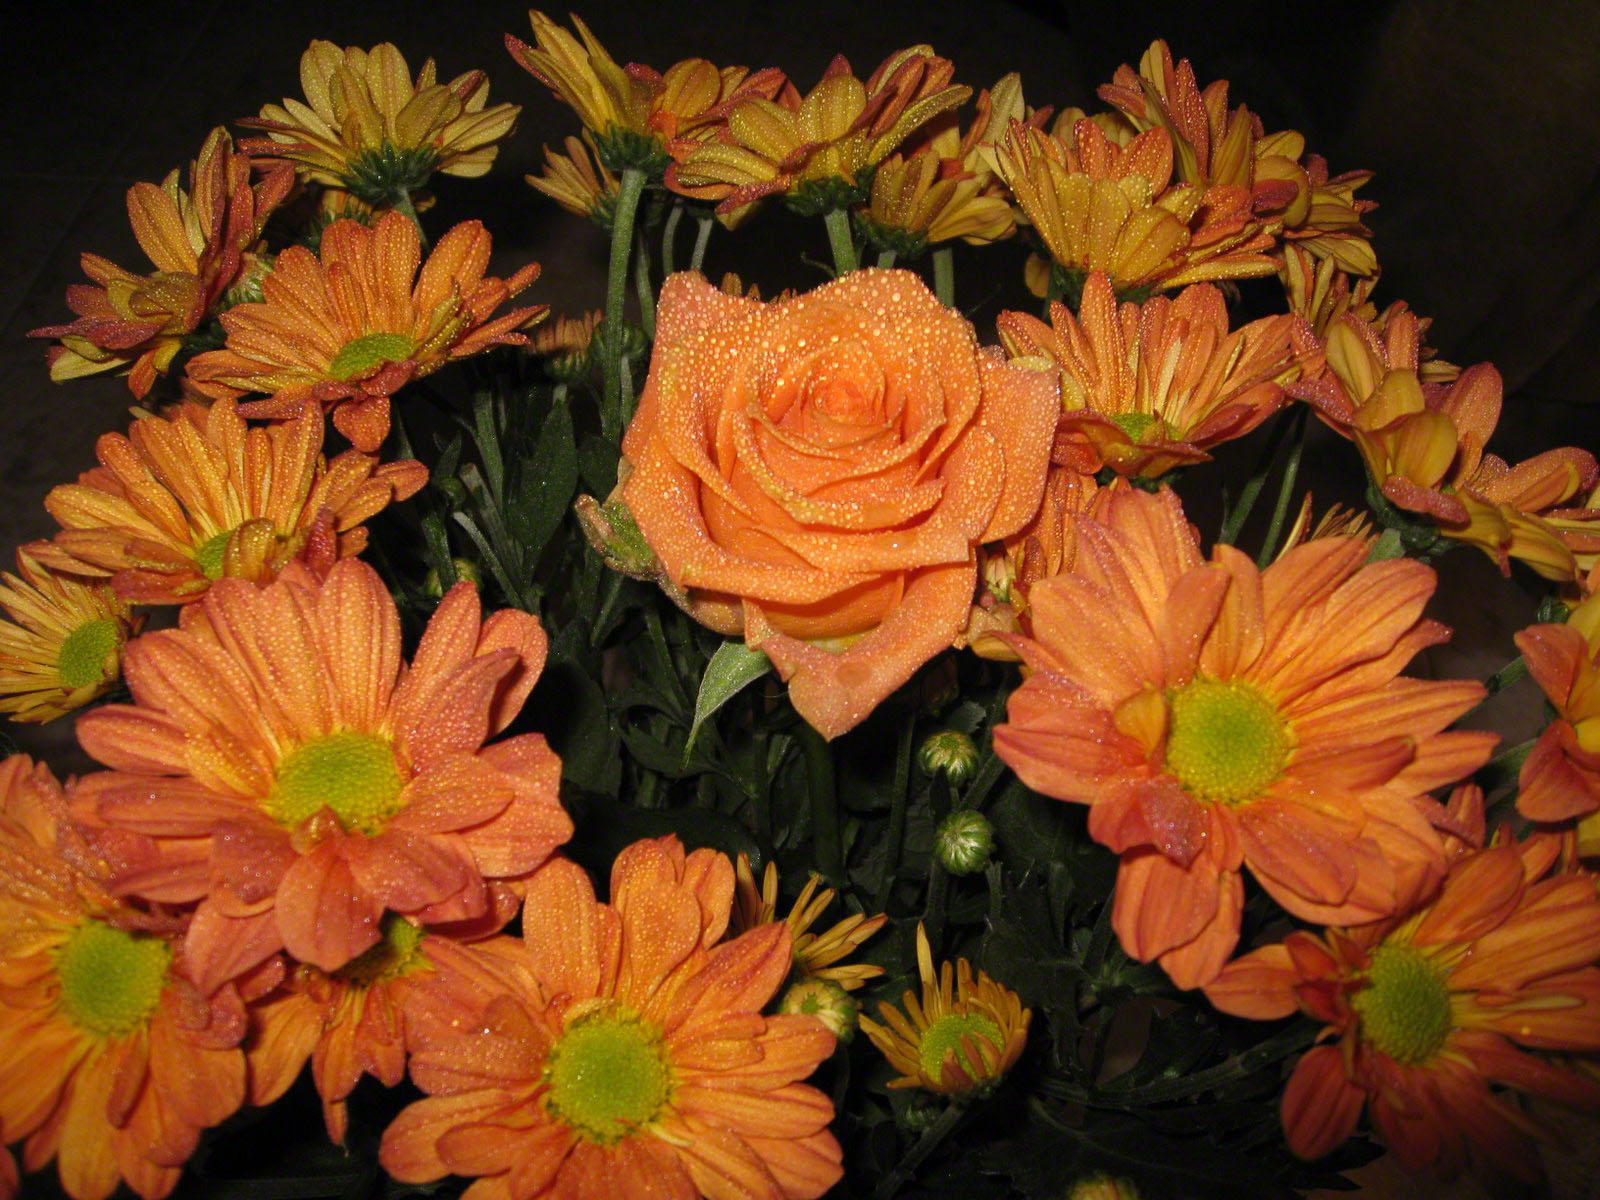 http://www.fabiovisentin.com/photography/photo/12/roses-wallpaper-roses-bouquets4387.JPG